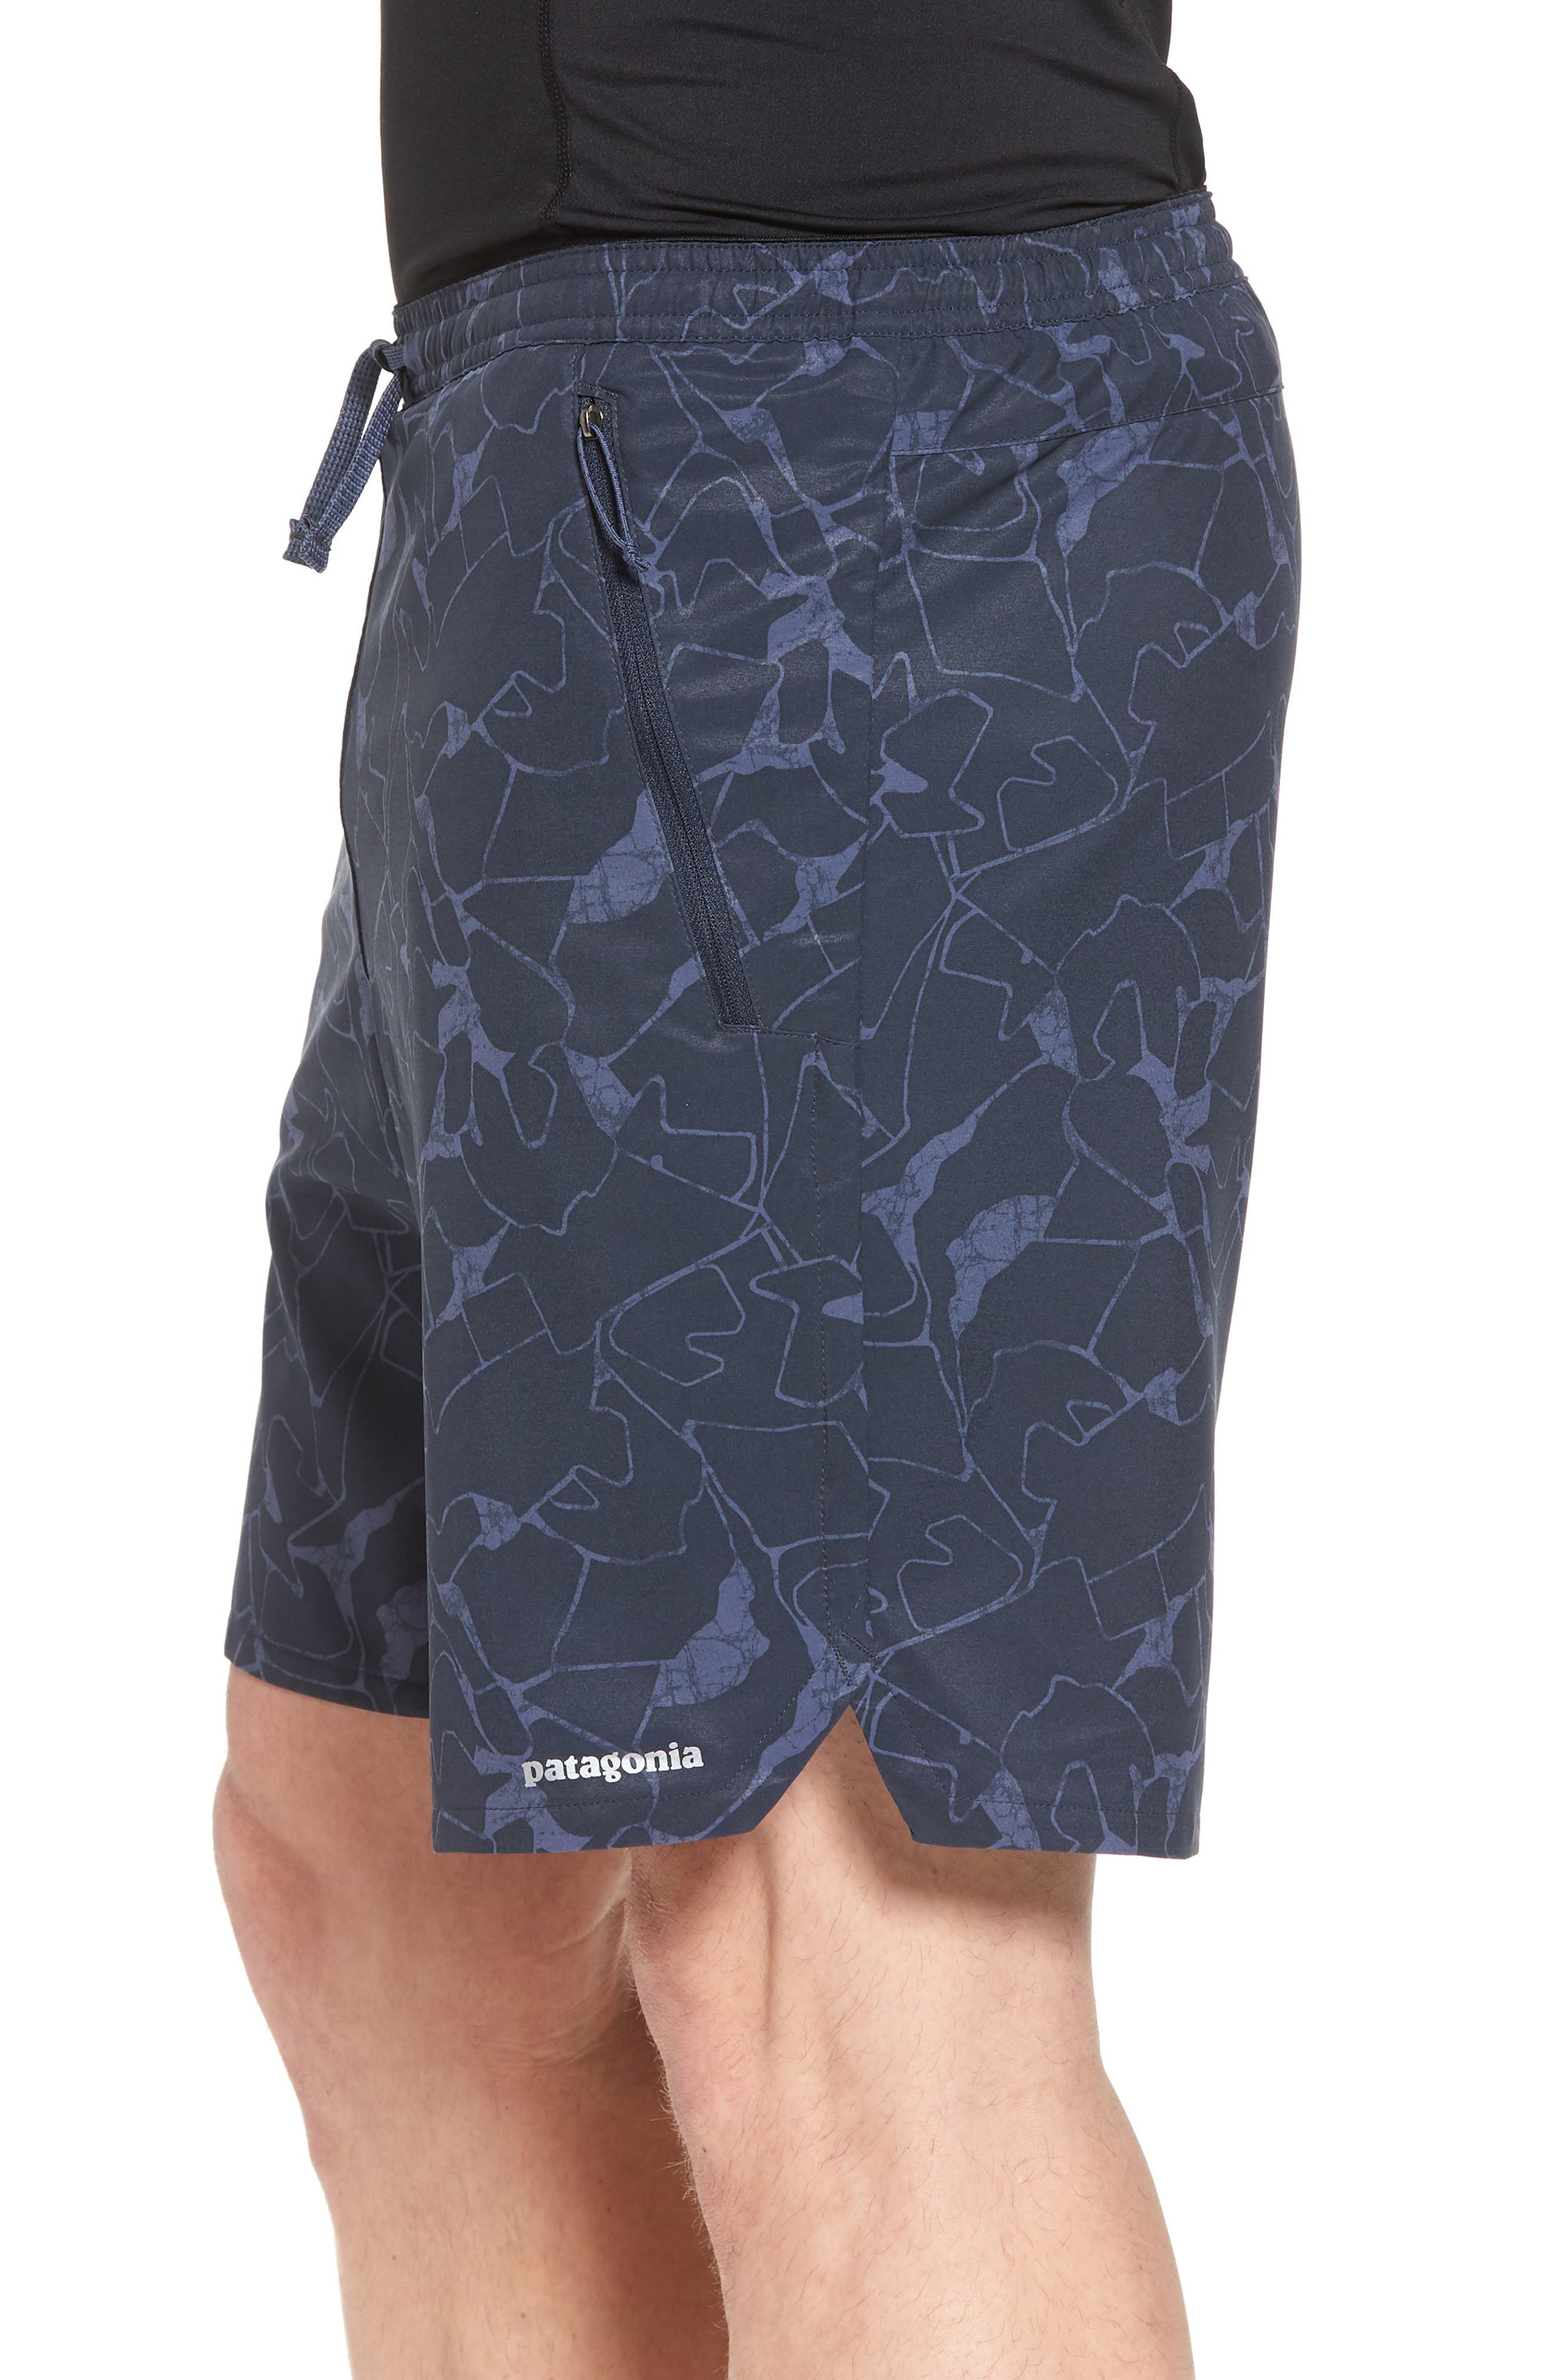 Nine Trails Hiking Shorts,                             Alternate thumbnail 3, color,                             Rock Jigsaw/ Smolder Blue